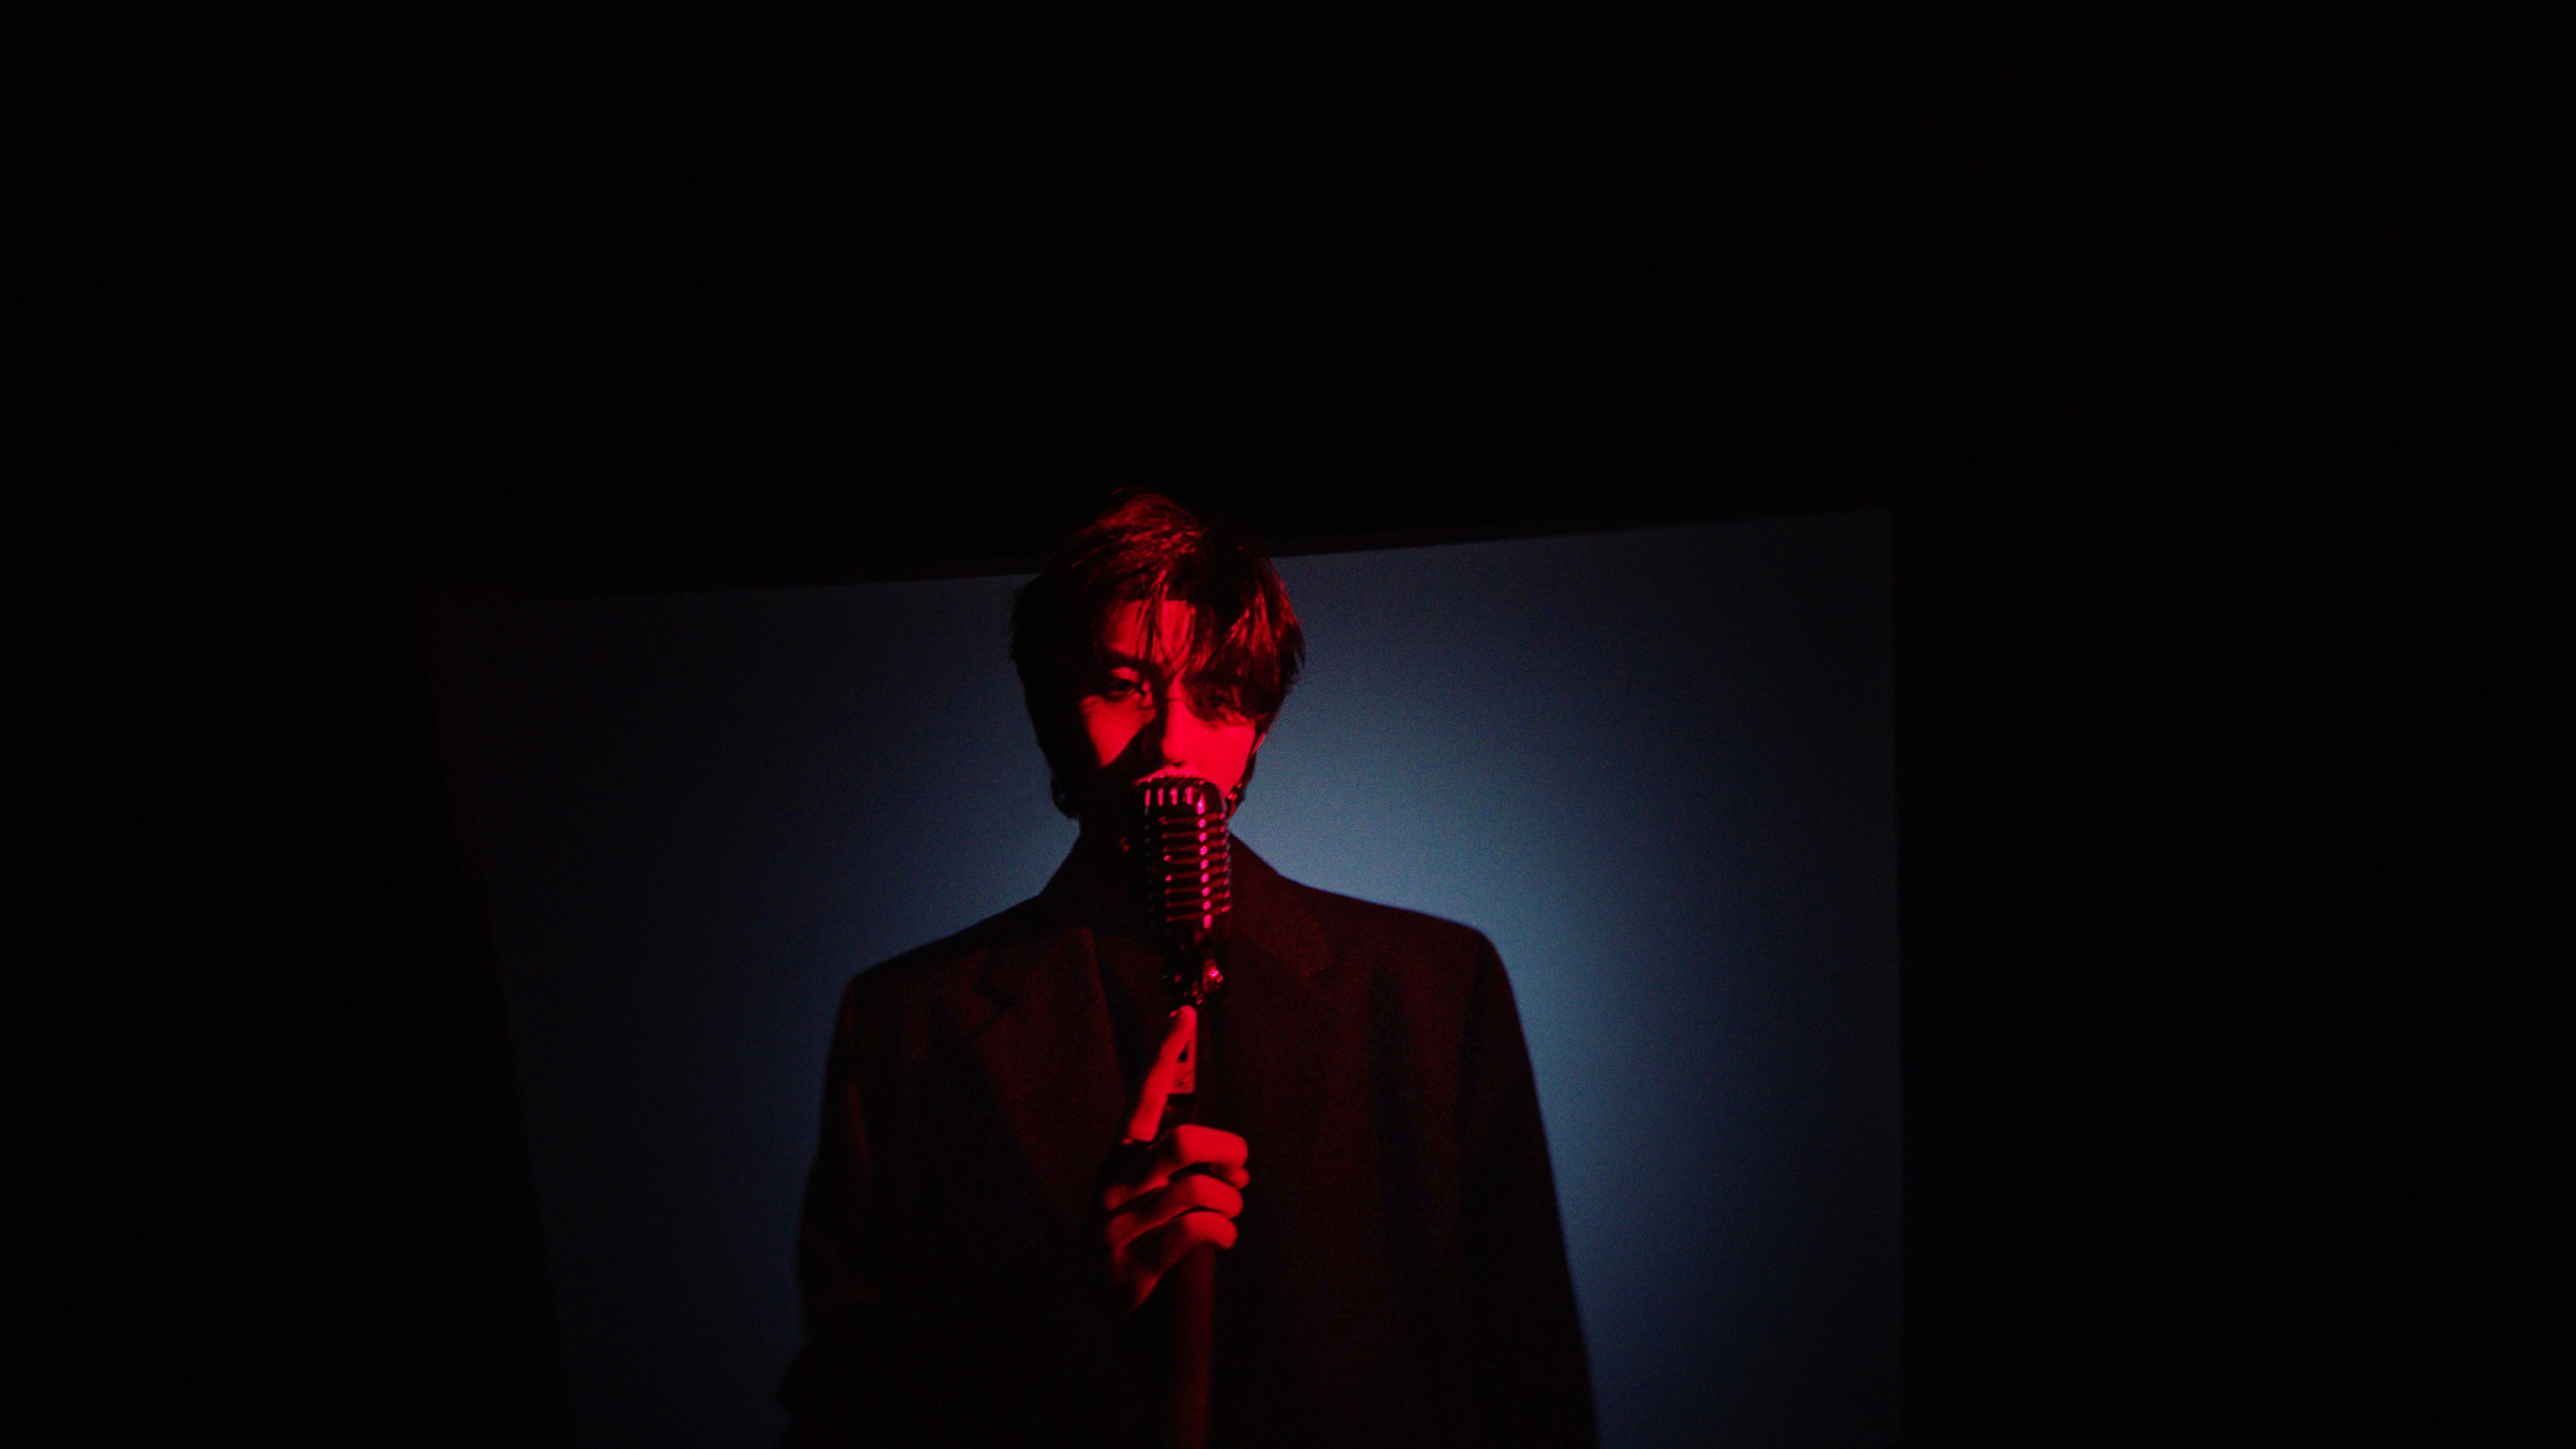 Cai Xukun starring in Prada Qixi campaign